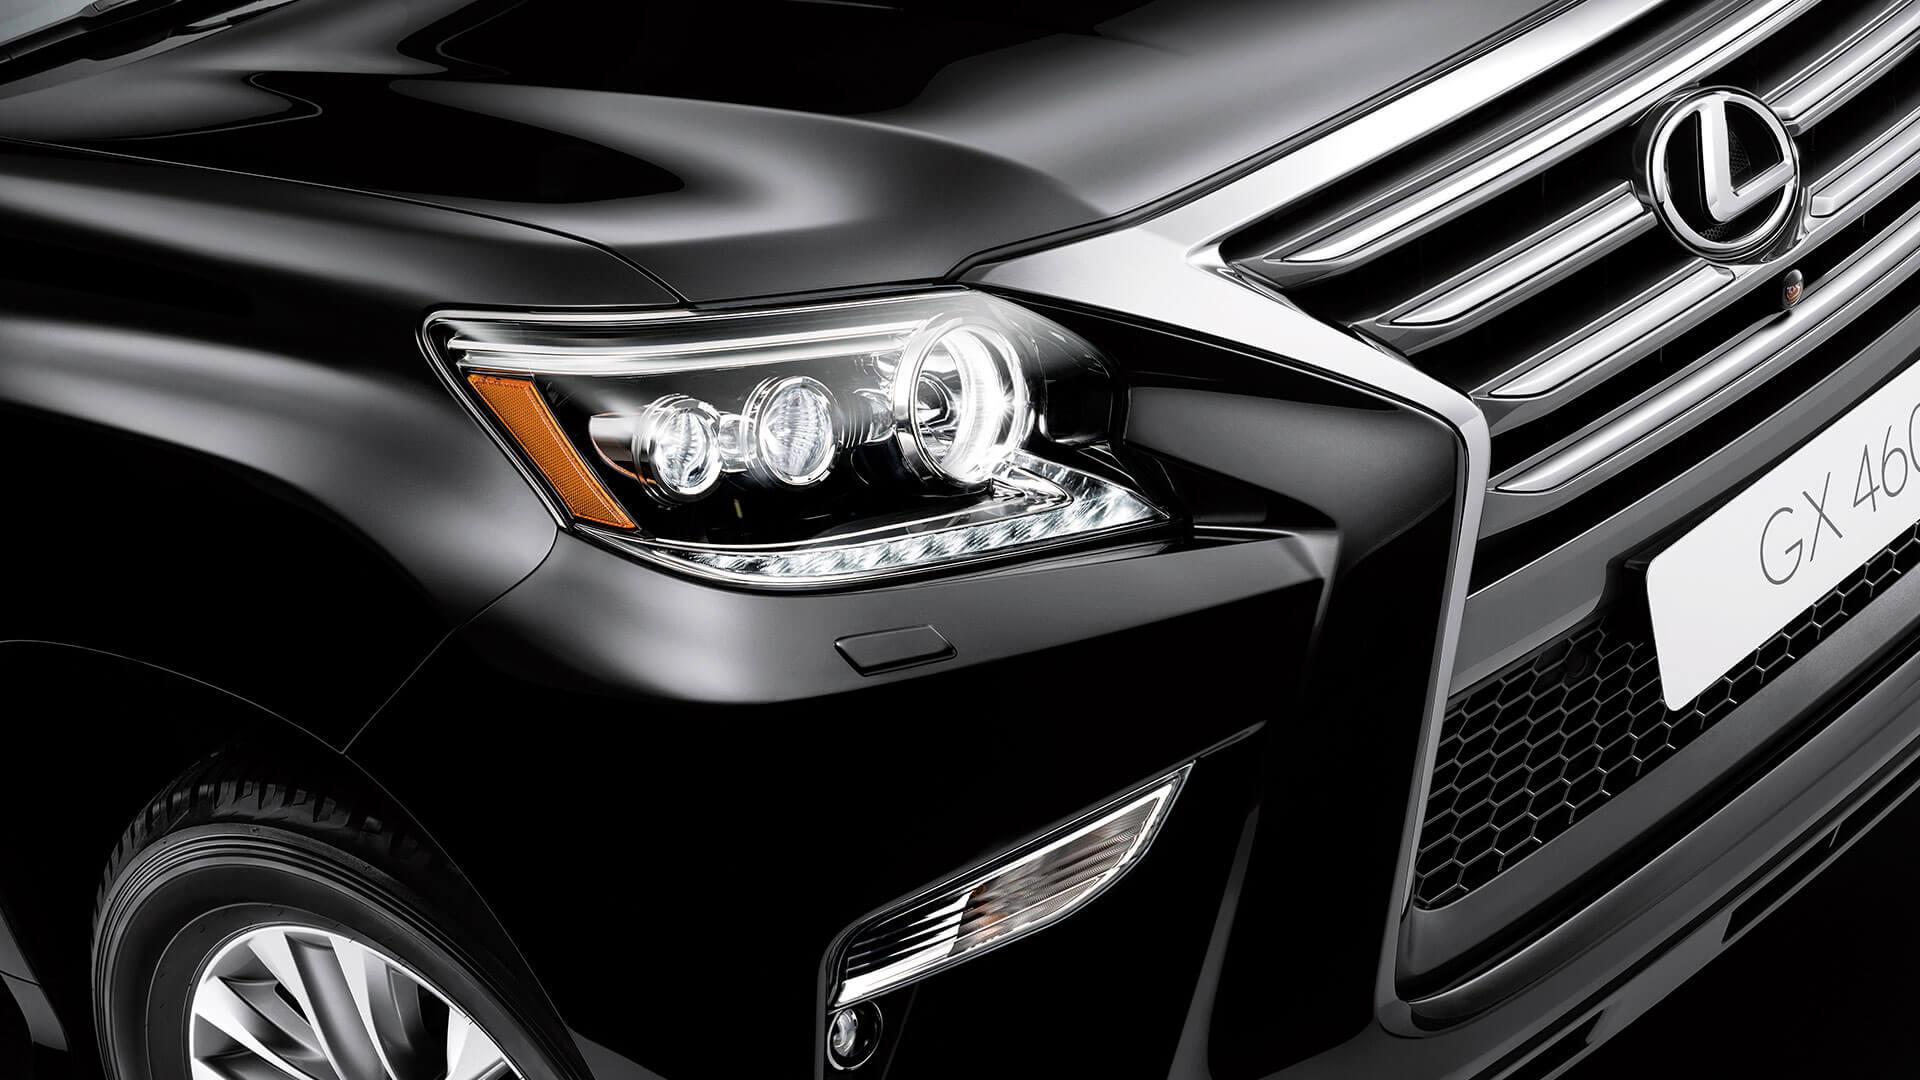 2017 lexus gx 460 features led headlight